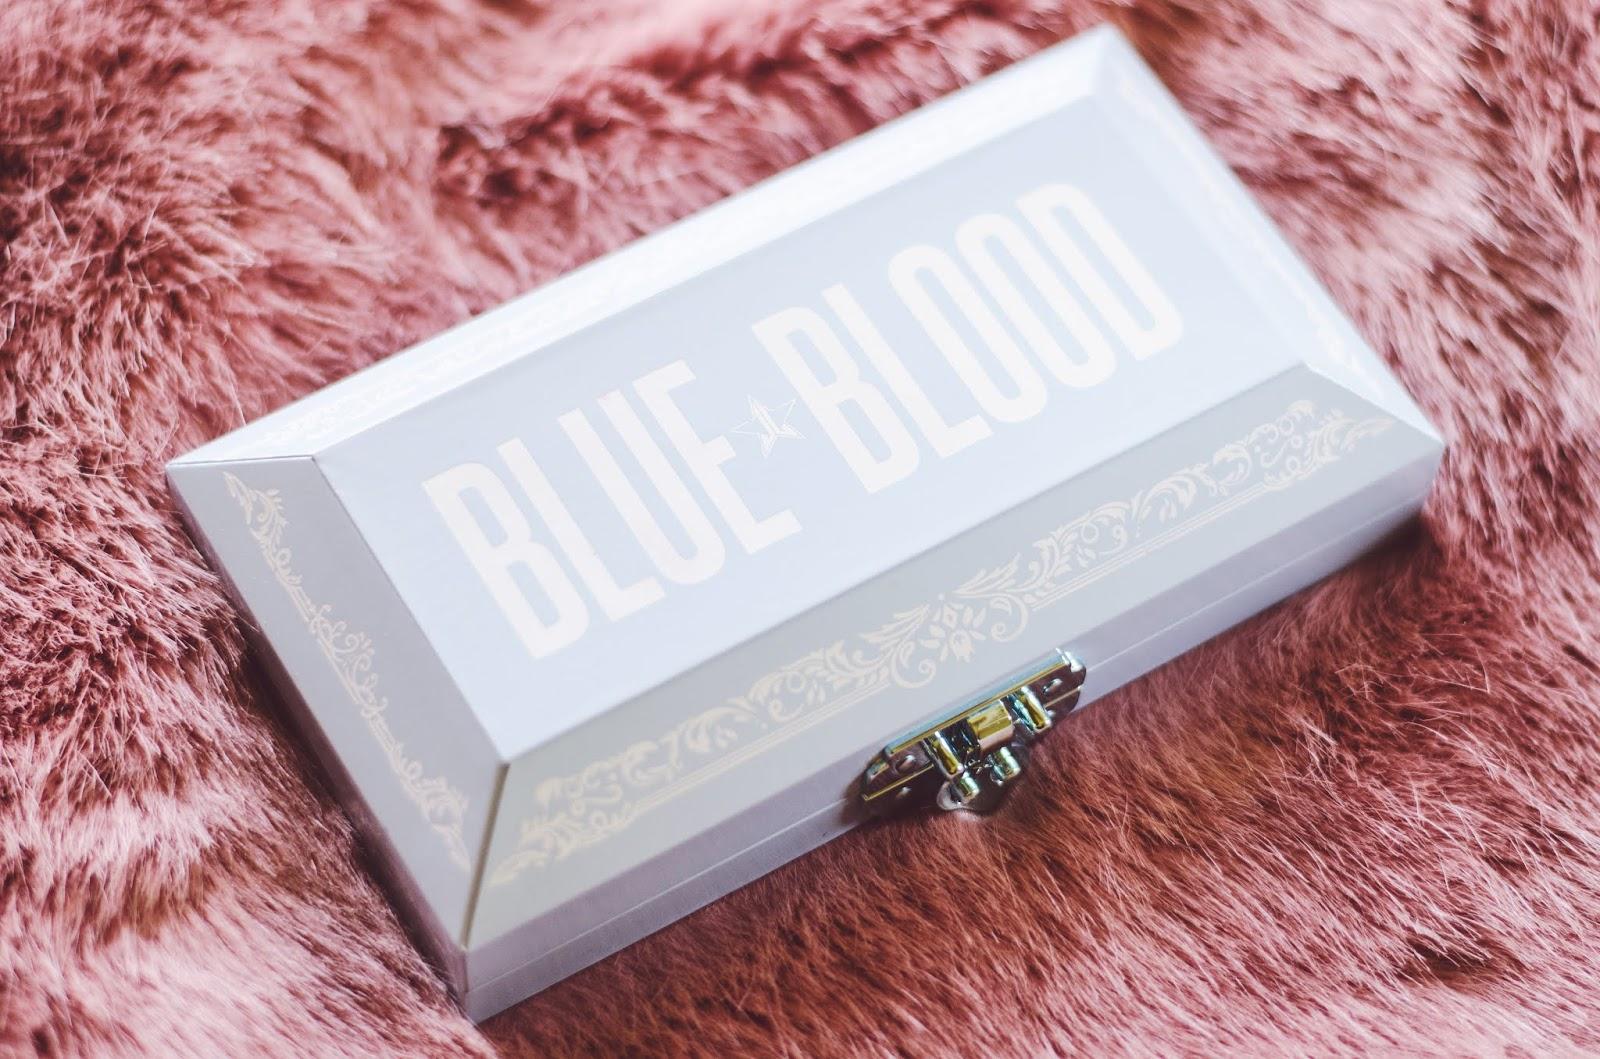 Jeffree Star Cosmetics Blue Blood Collection paleta očných tieňov